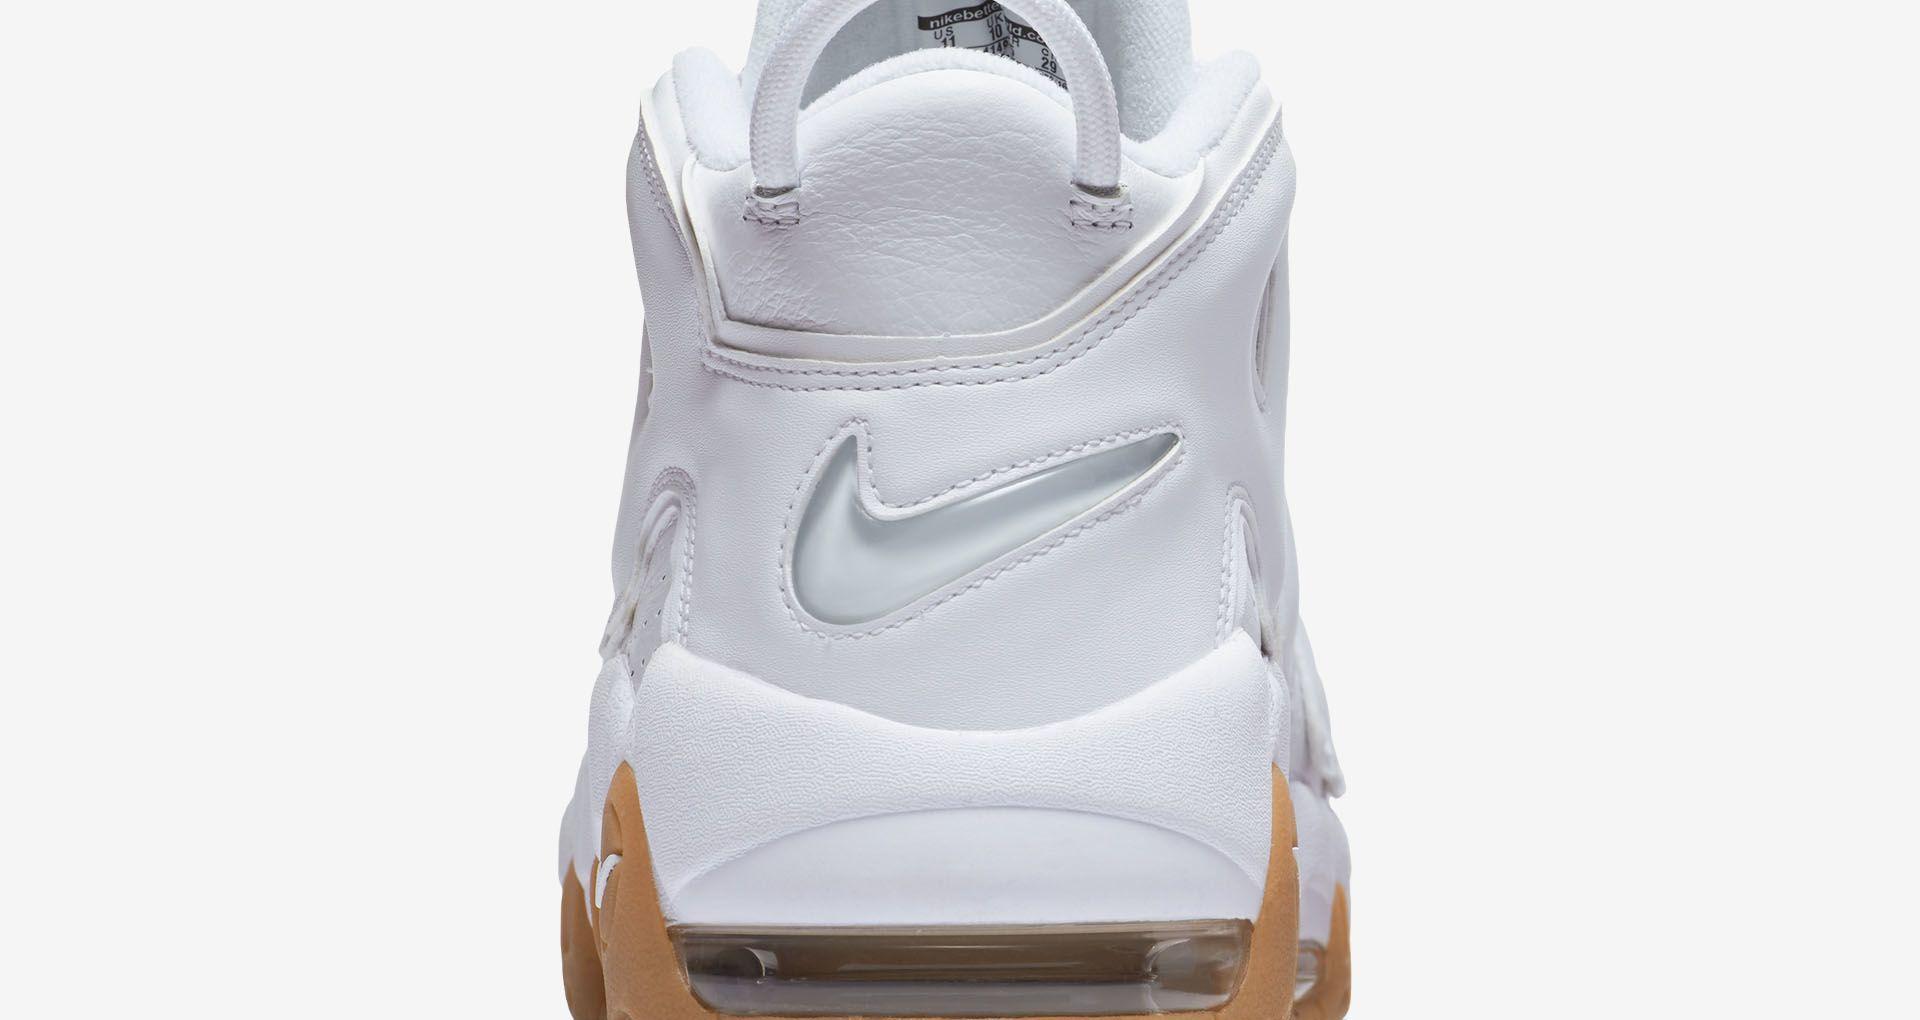 premium selection 7bdc3 74149 Nike Air More Uptempo 'Triple White'. Nike+ SNKRS